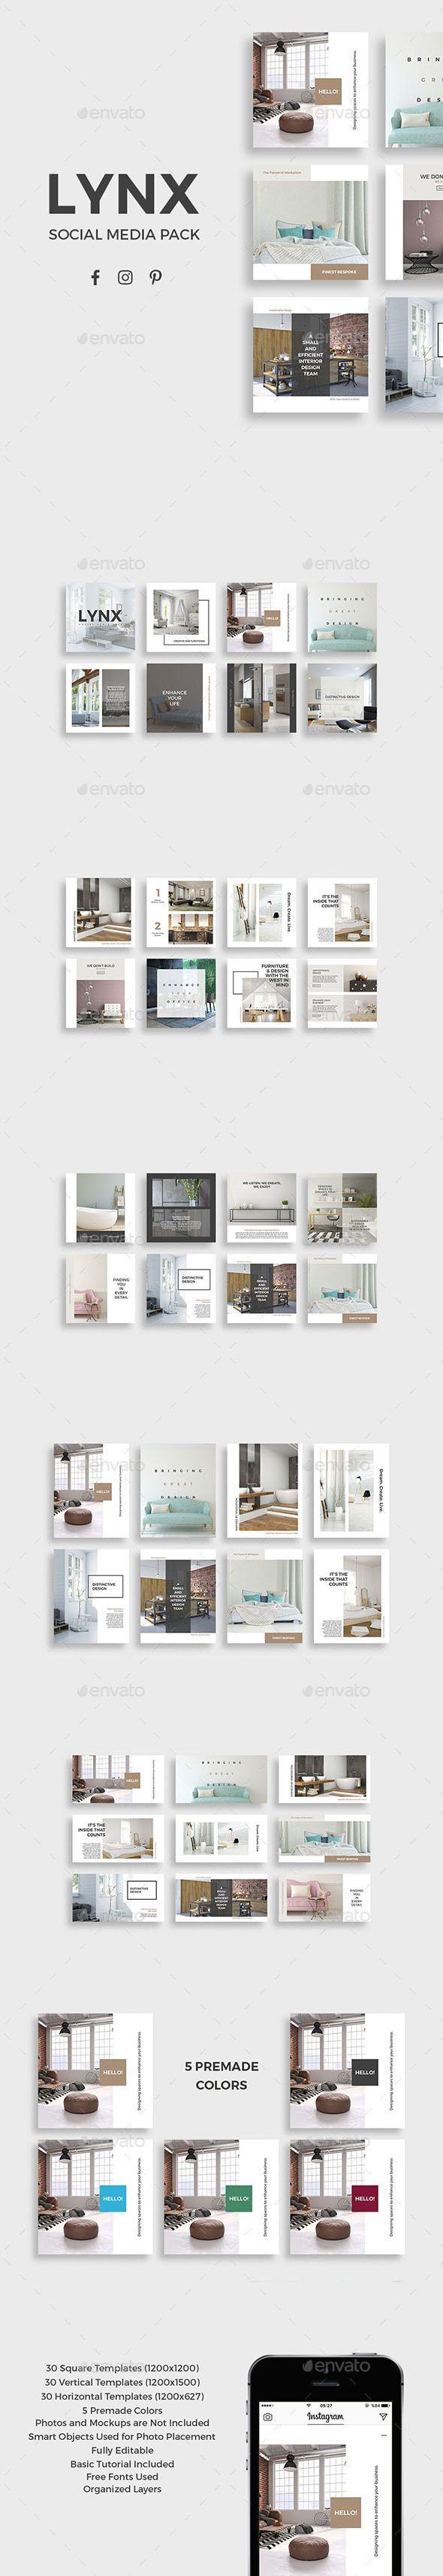 Lynx Social Media Pack — Photoshop PSD #home decor #manufacturer • Download ➝ https://graphicriver.net/item/lynx-social-media-pack/19616209?ref=pxcr